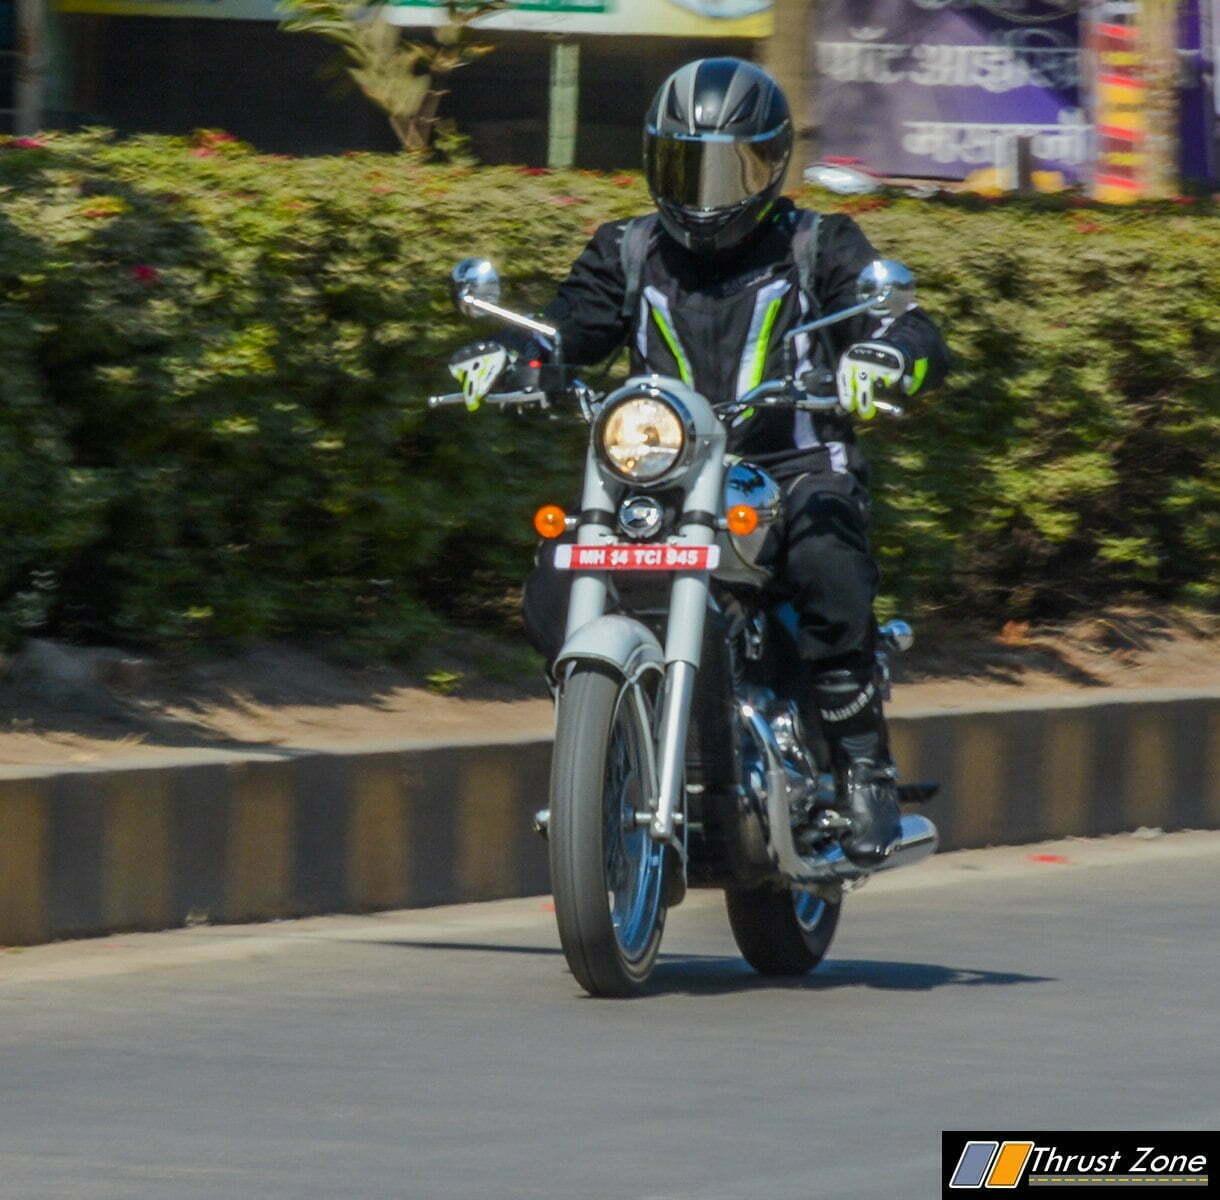 http://www.thrustzone.com/wp-content/uploads/2019/01/jawa-300-classic-india-review-8.jpg